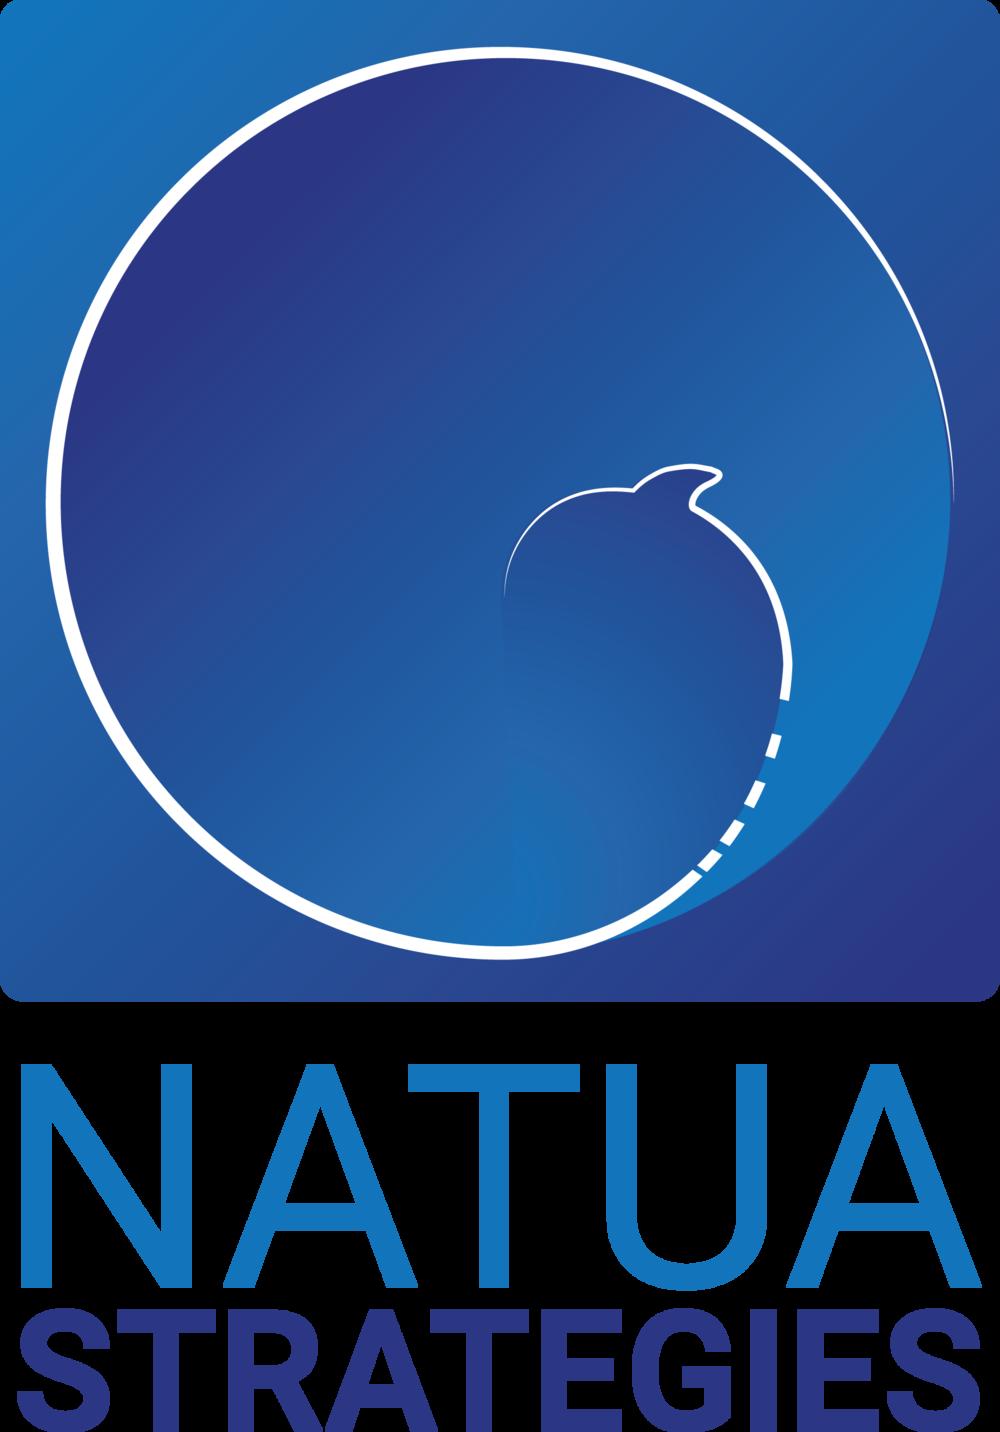 Natua Strategies Vertical Logo - 300dpi.png